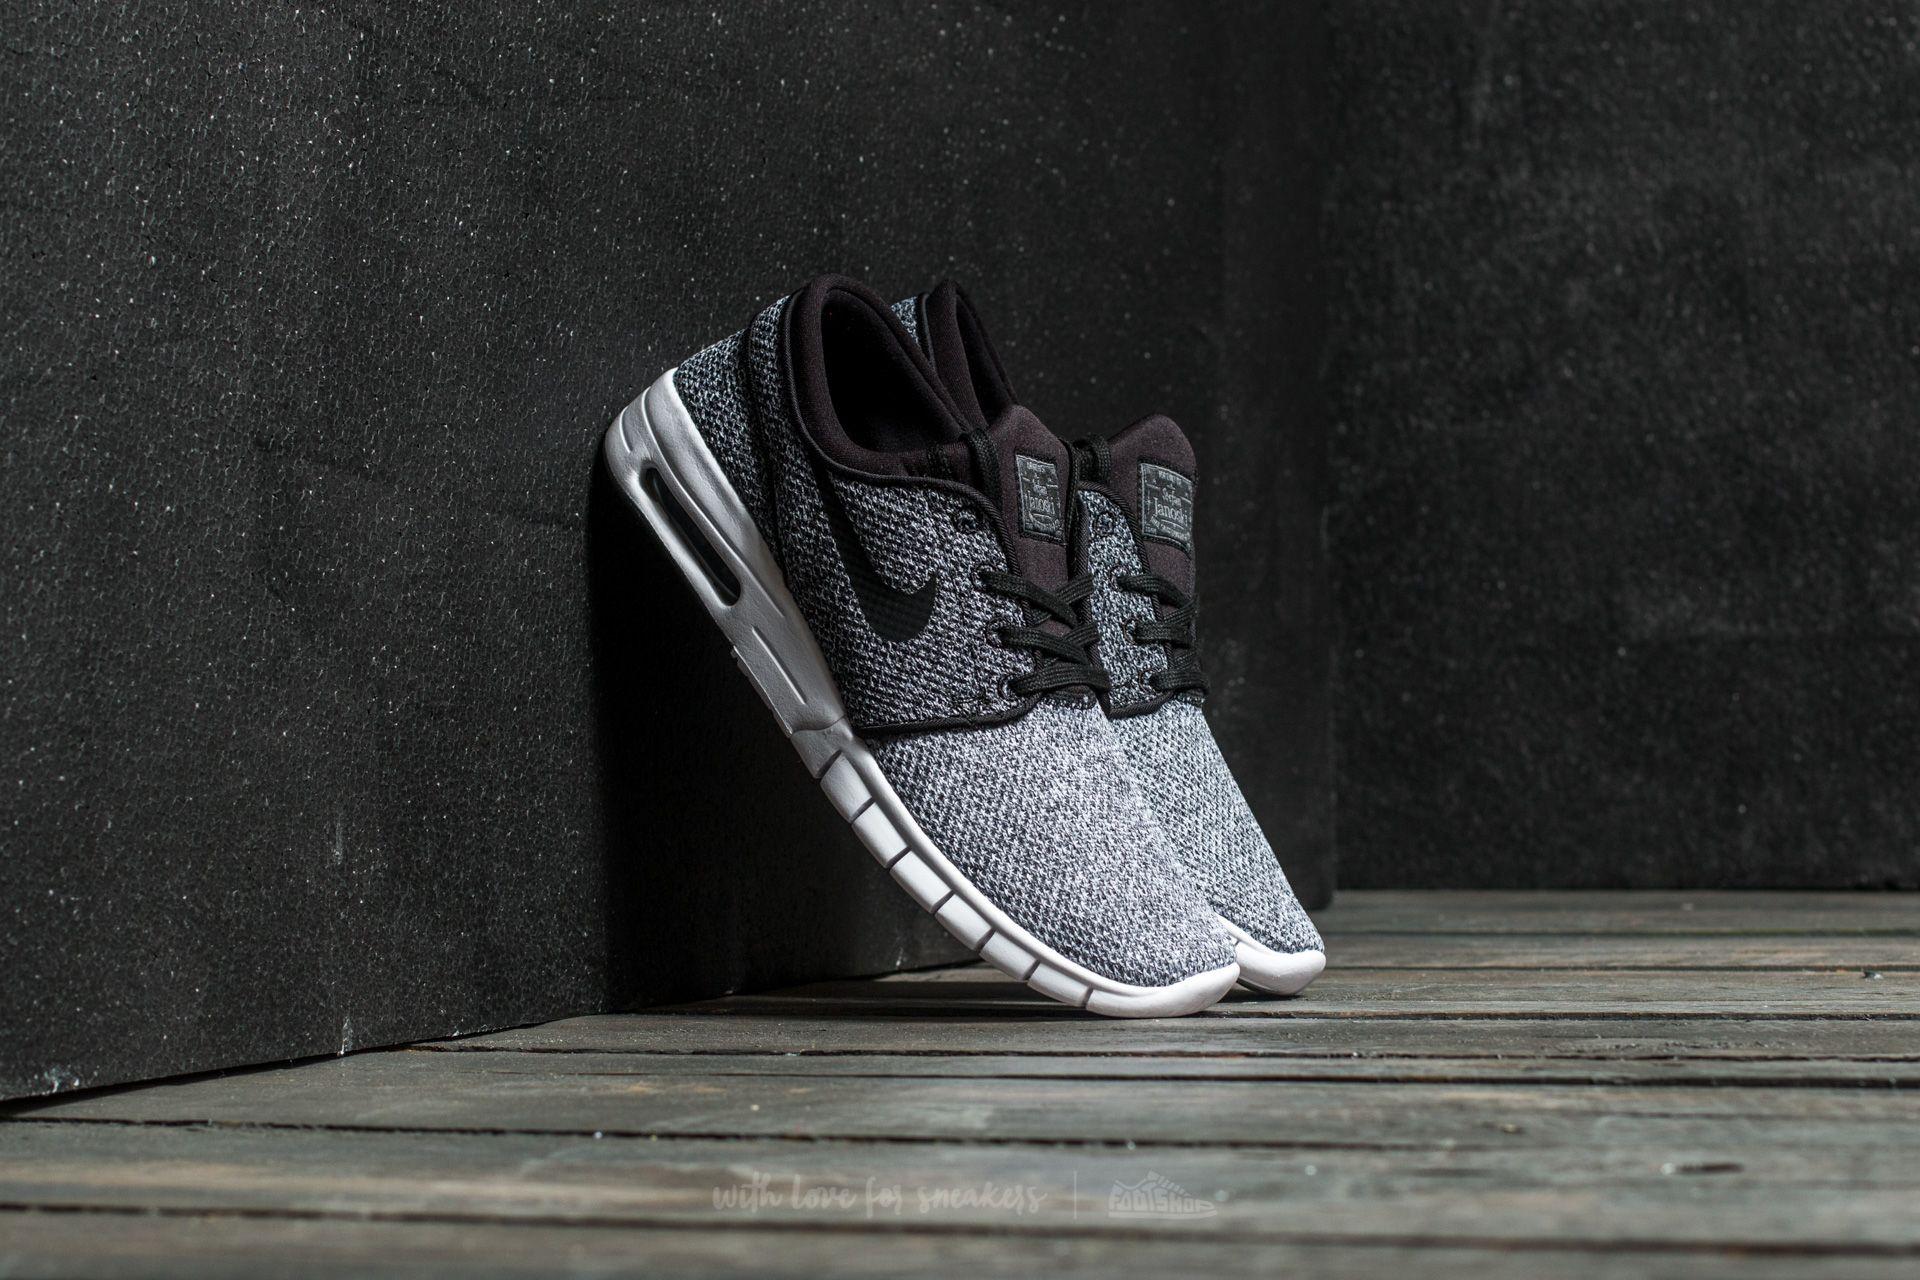 black and grey janoskis